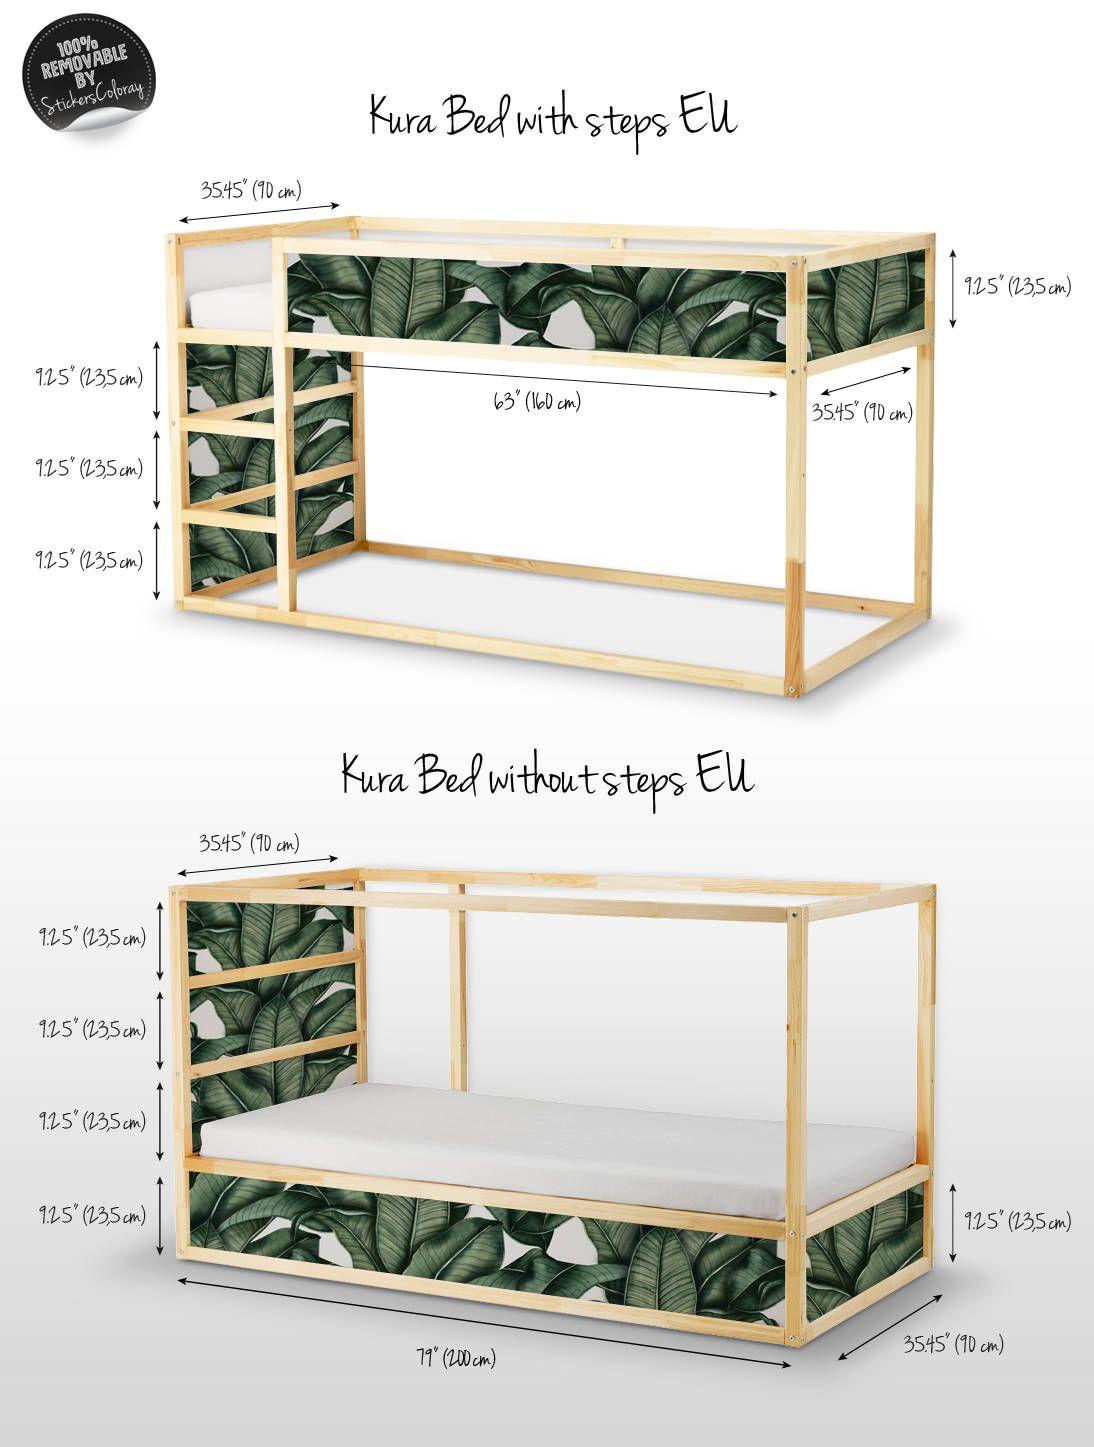 Decals For Kura Bed Ikea Banana Leaf Bed Sticker Set Pack Jacks  # Muebles Hoja De Banano